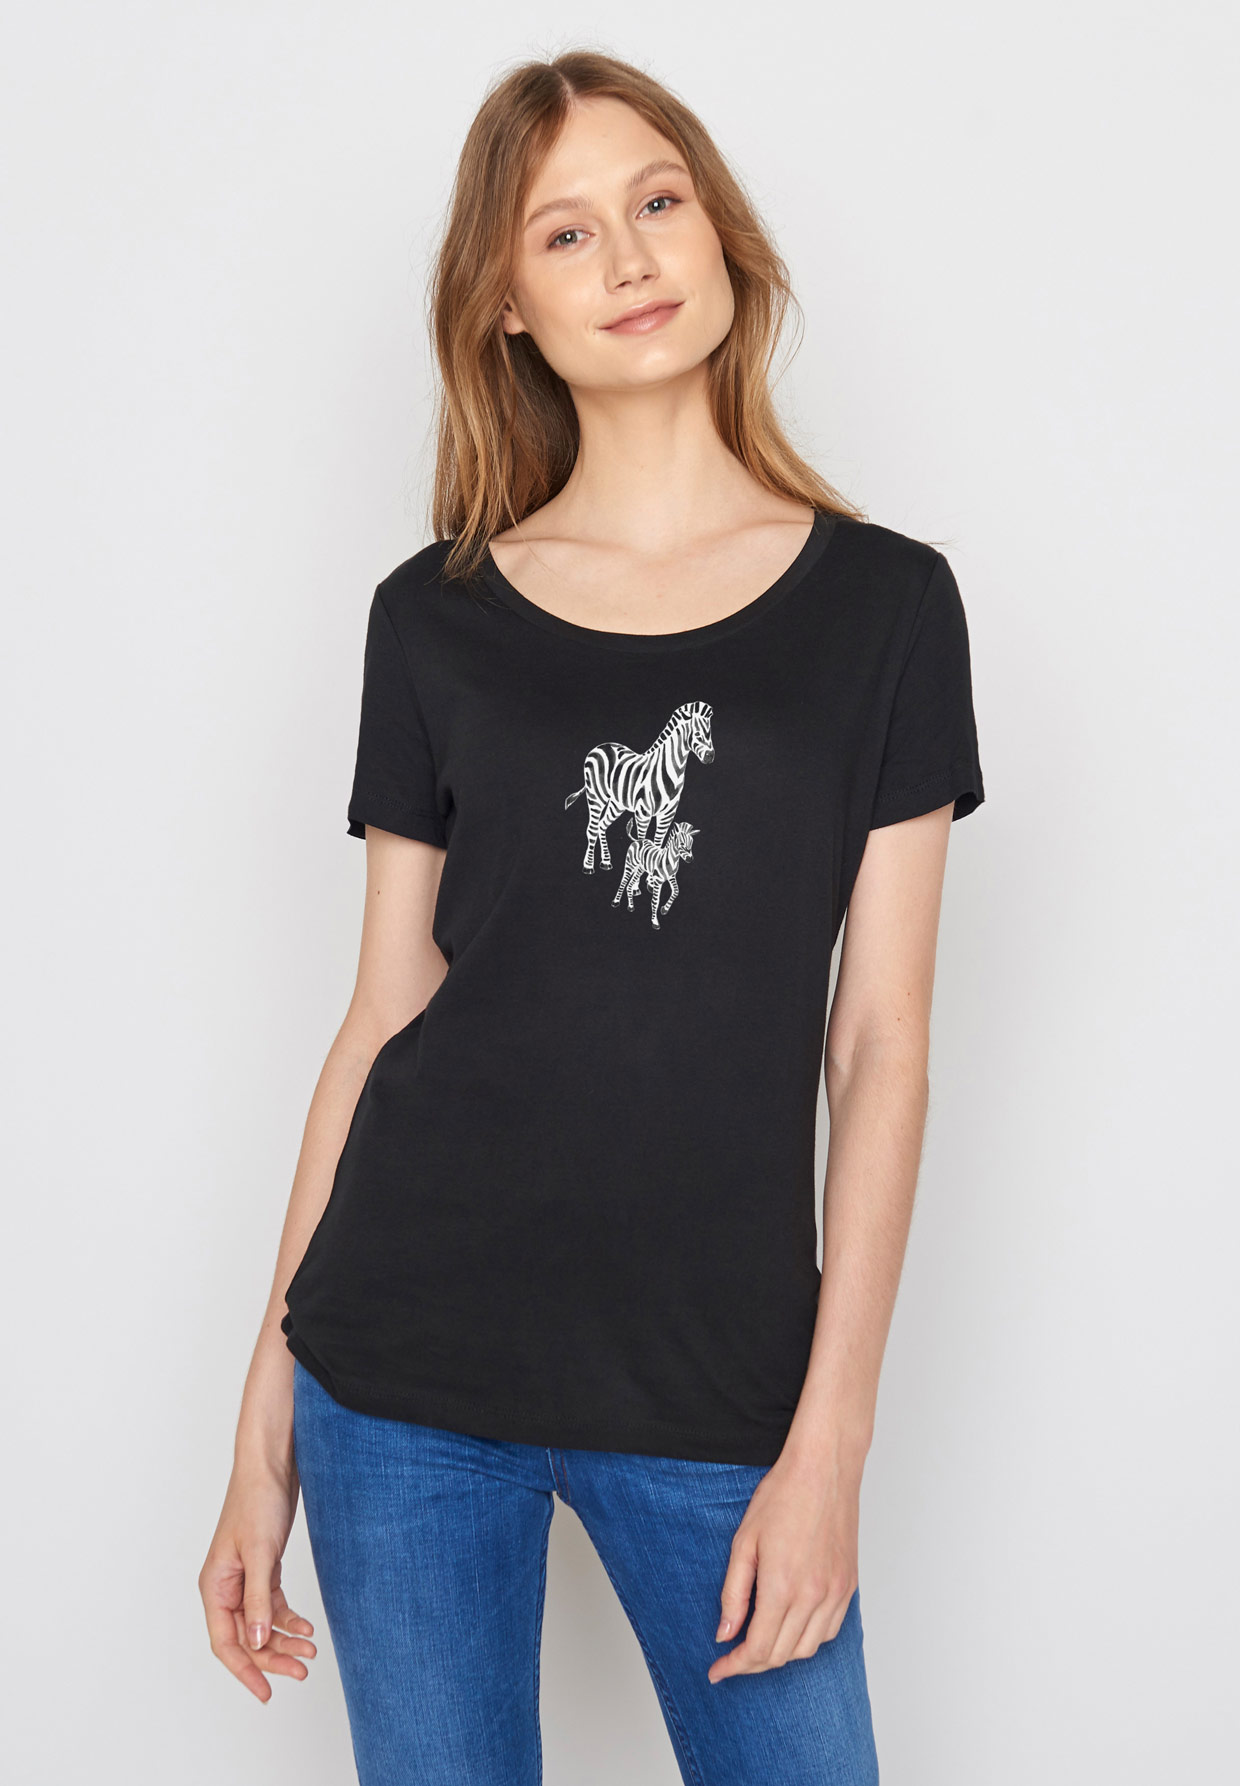 GREENBOMB-ANIMAL-ZEBRAS-Shirt-black